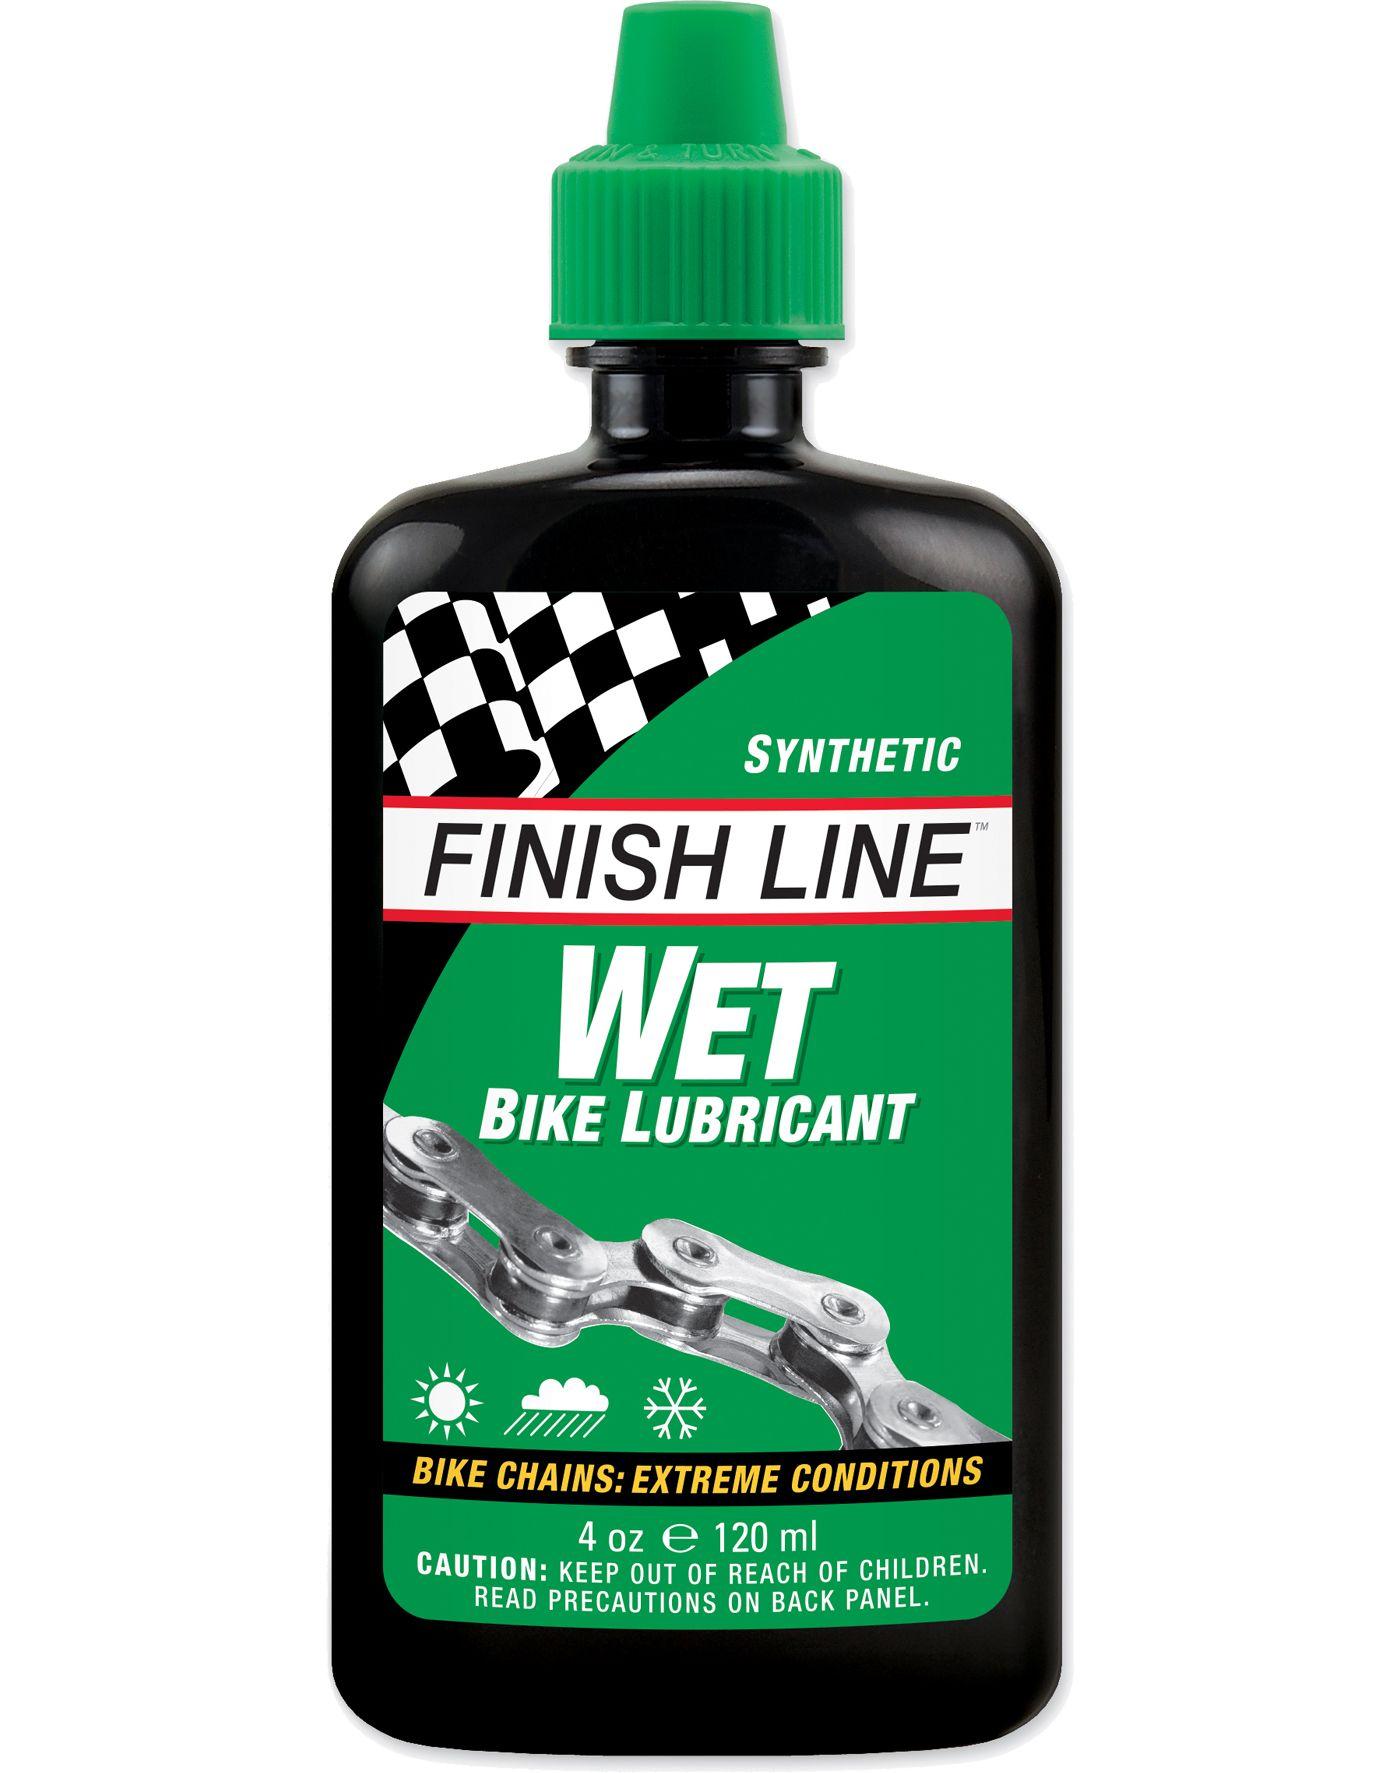 Finish Line Wet Bike Chain Lube